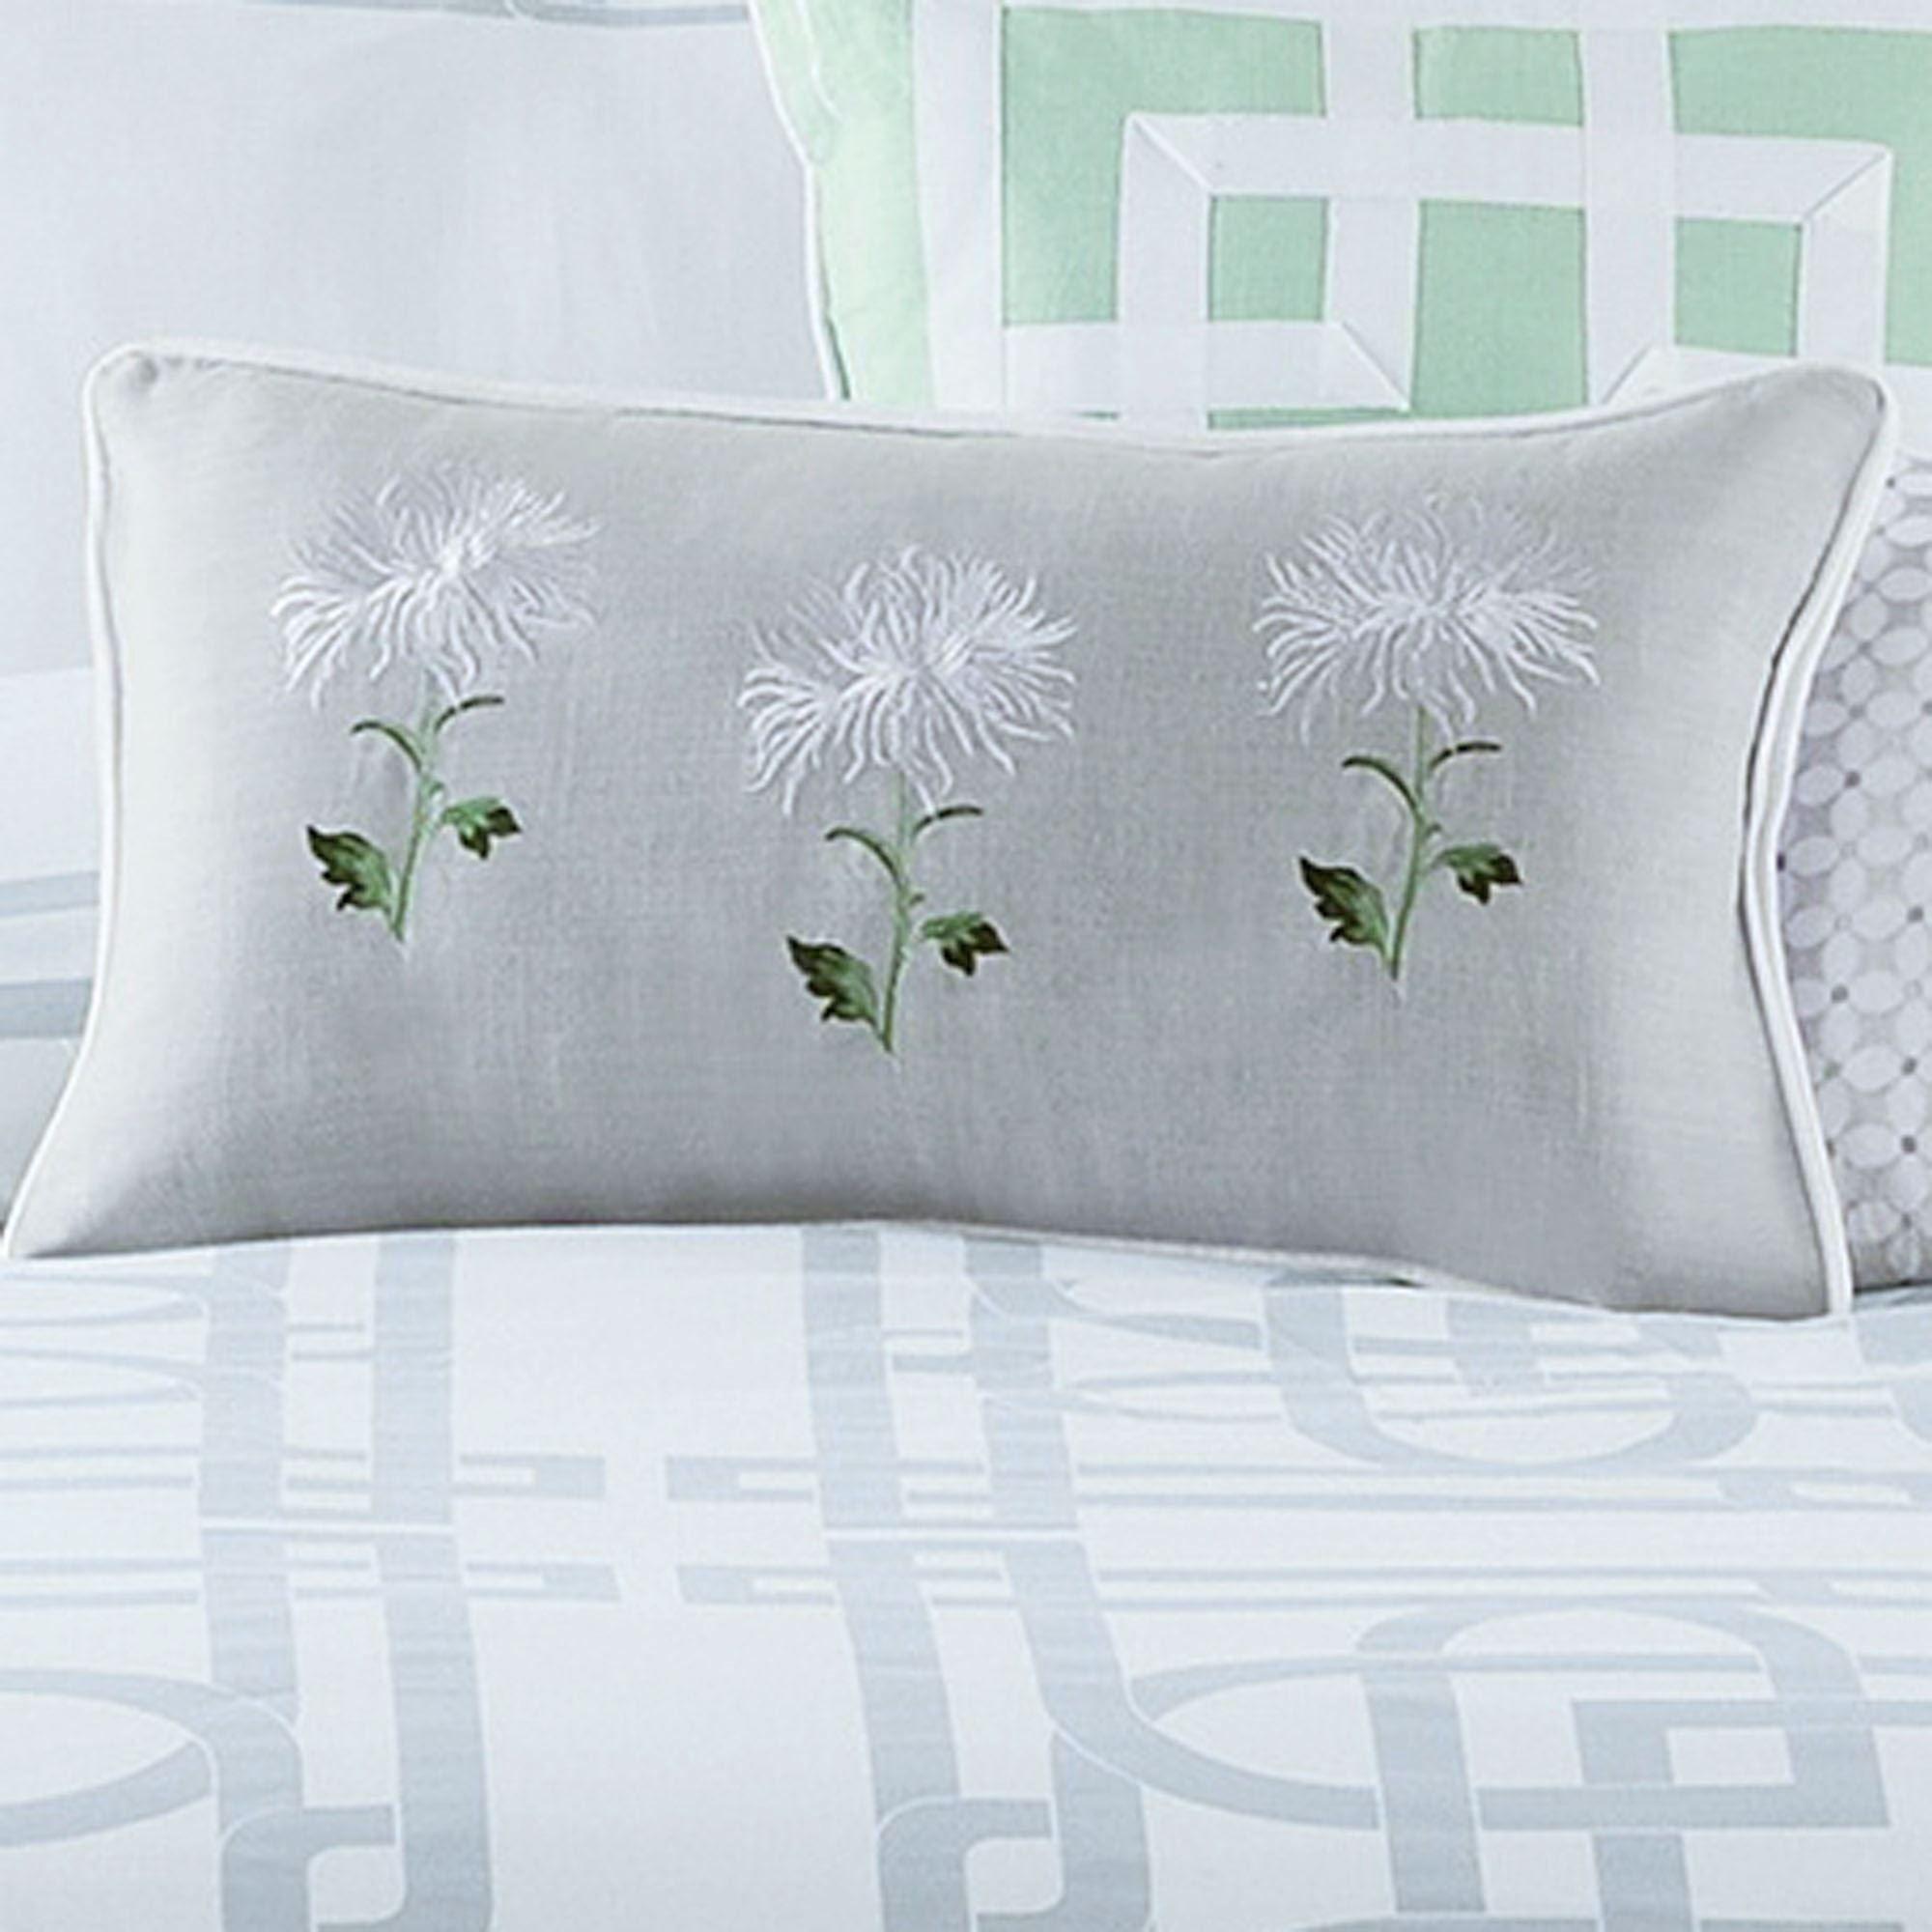 magnificent mainstays set at trellis pillow inspirations decorative of pictures pillows sofa com walmart